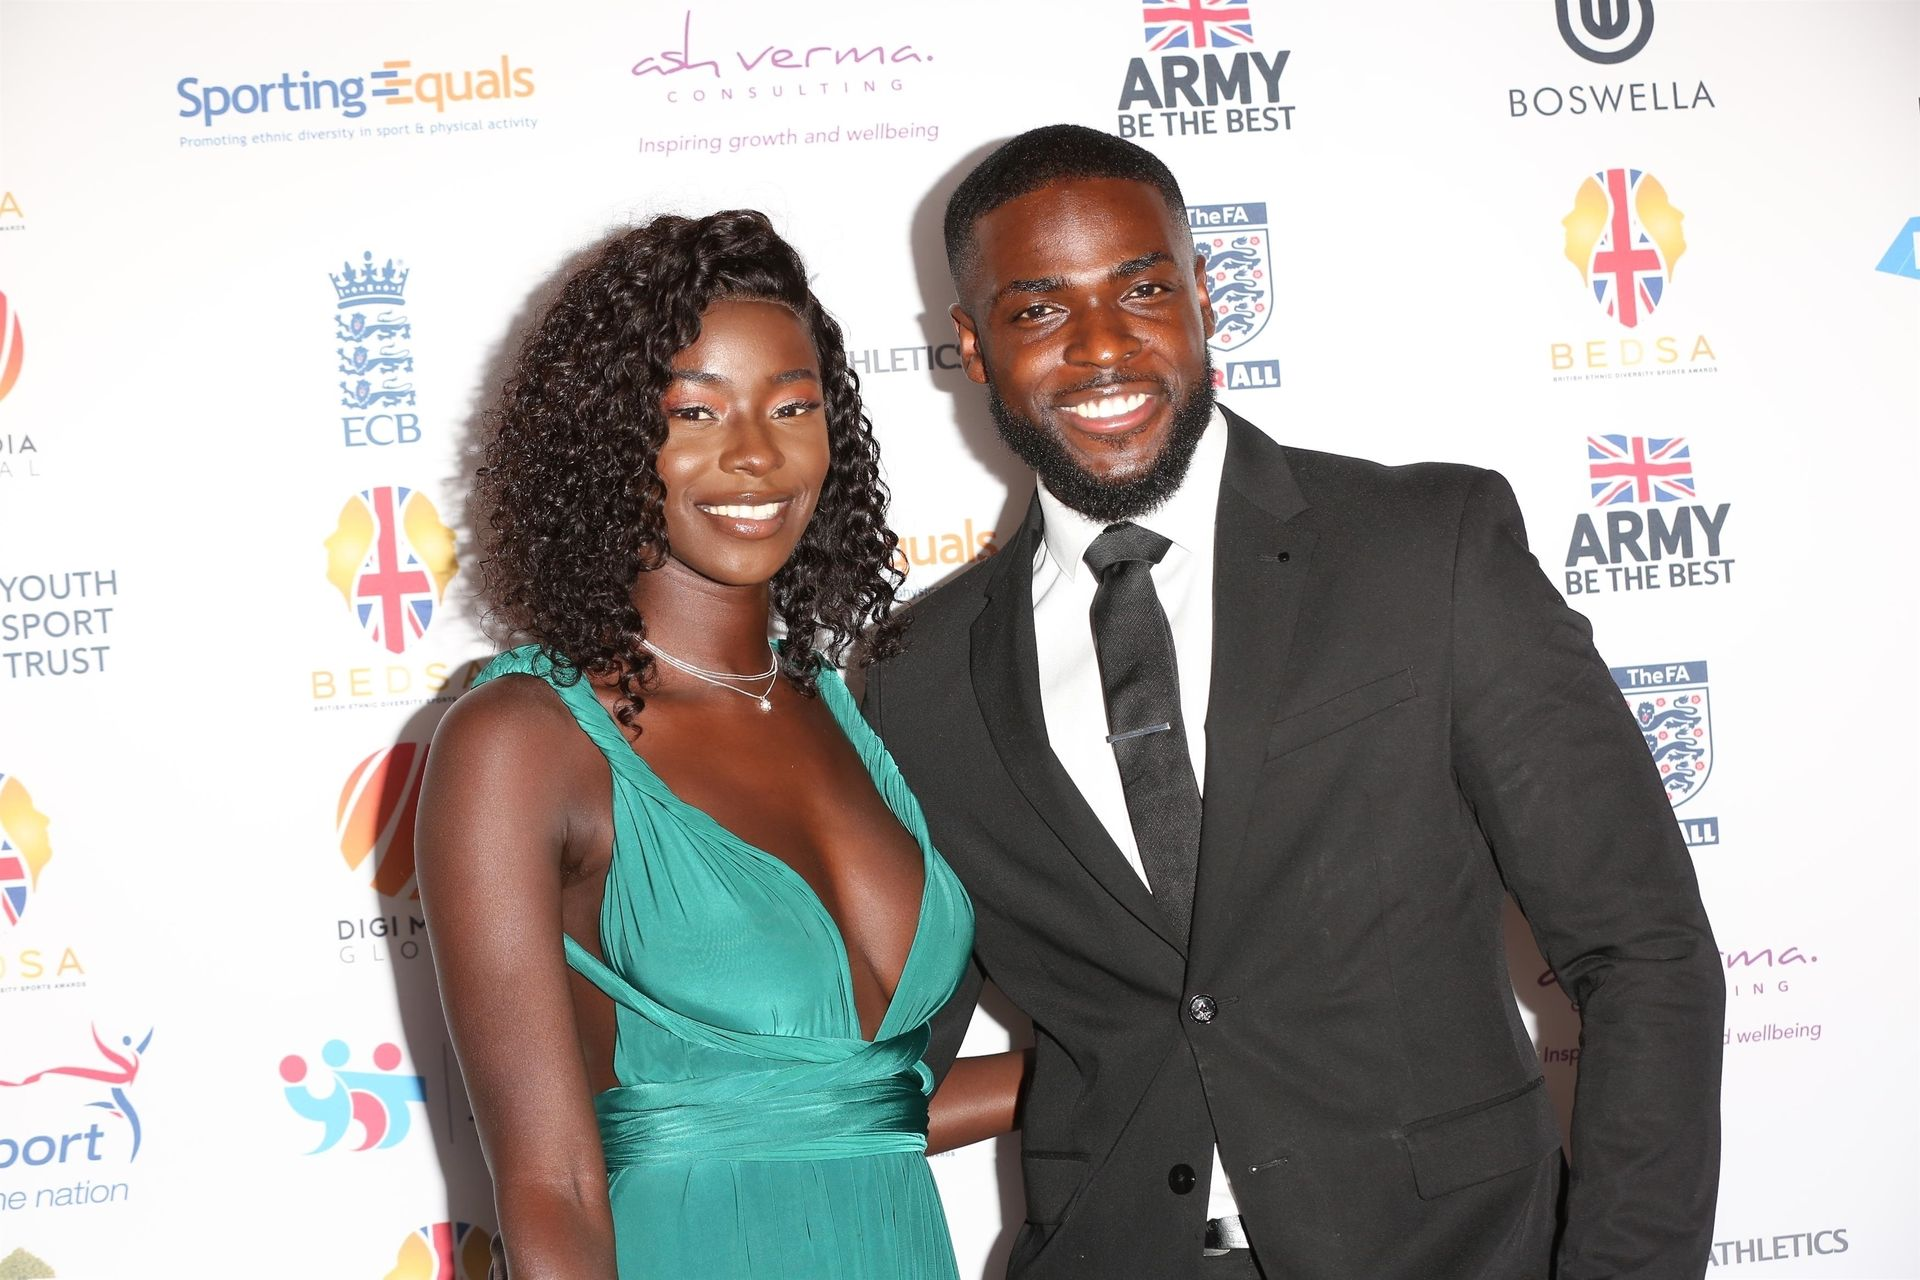 Mike Boateng & Priscilla Anyabu Are Seen At British Ethnic Diversity Sports Awards 0018